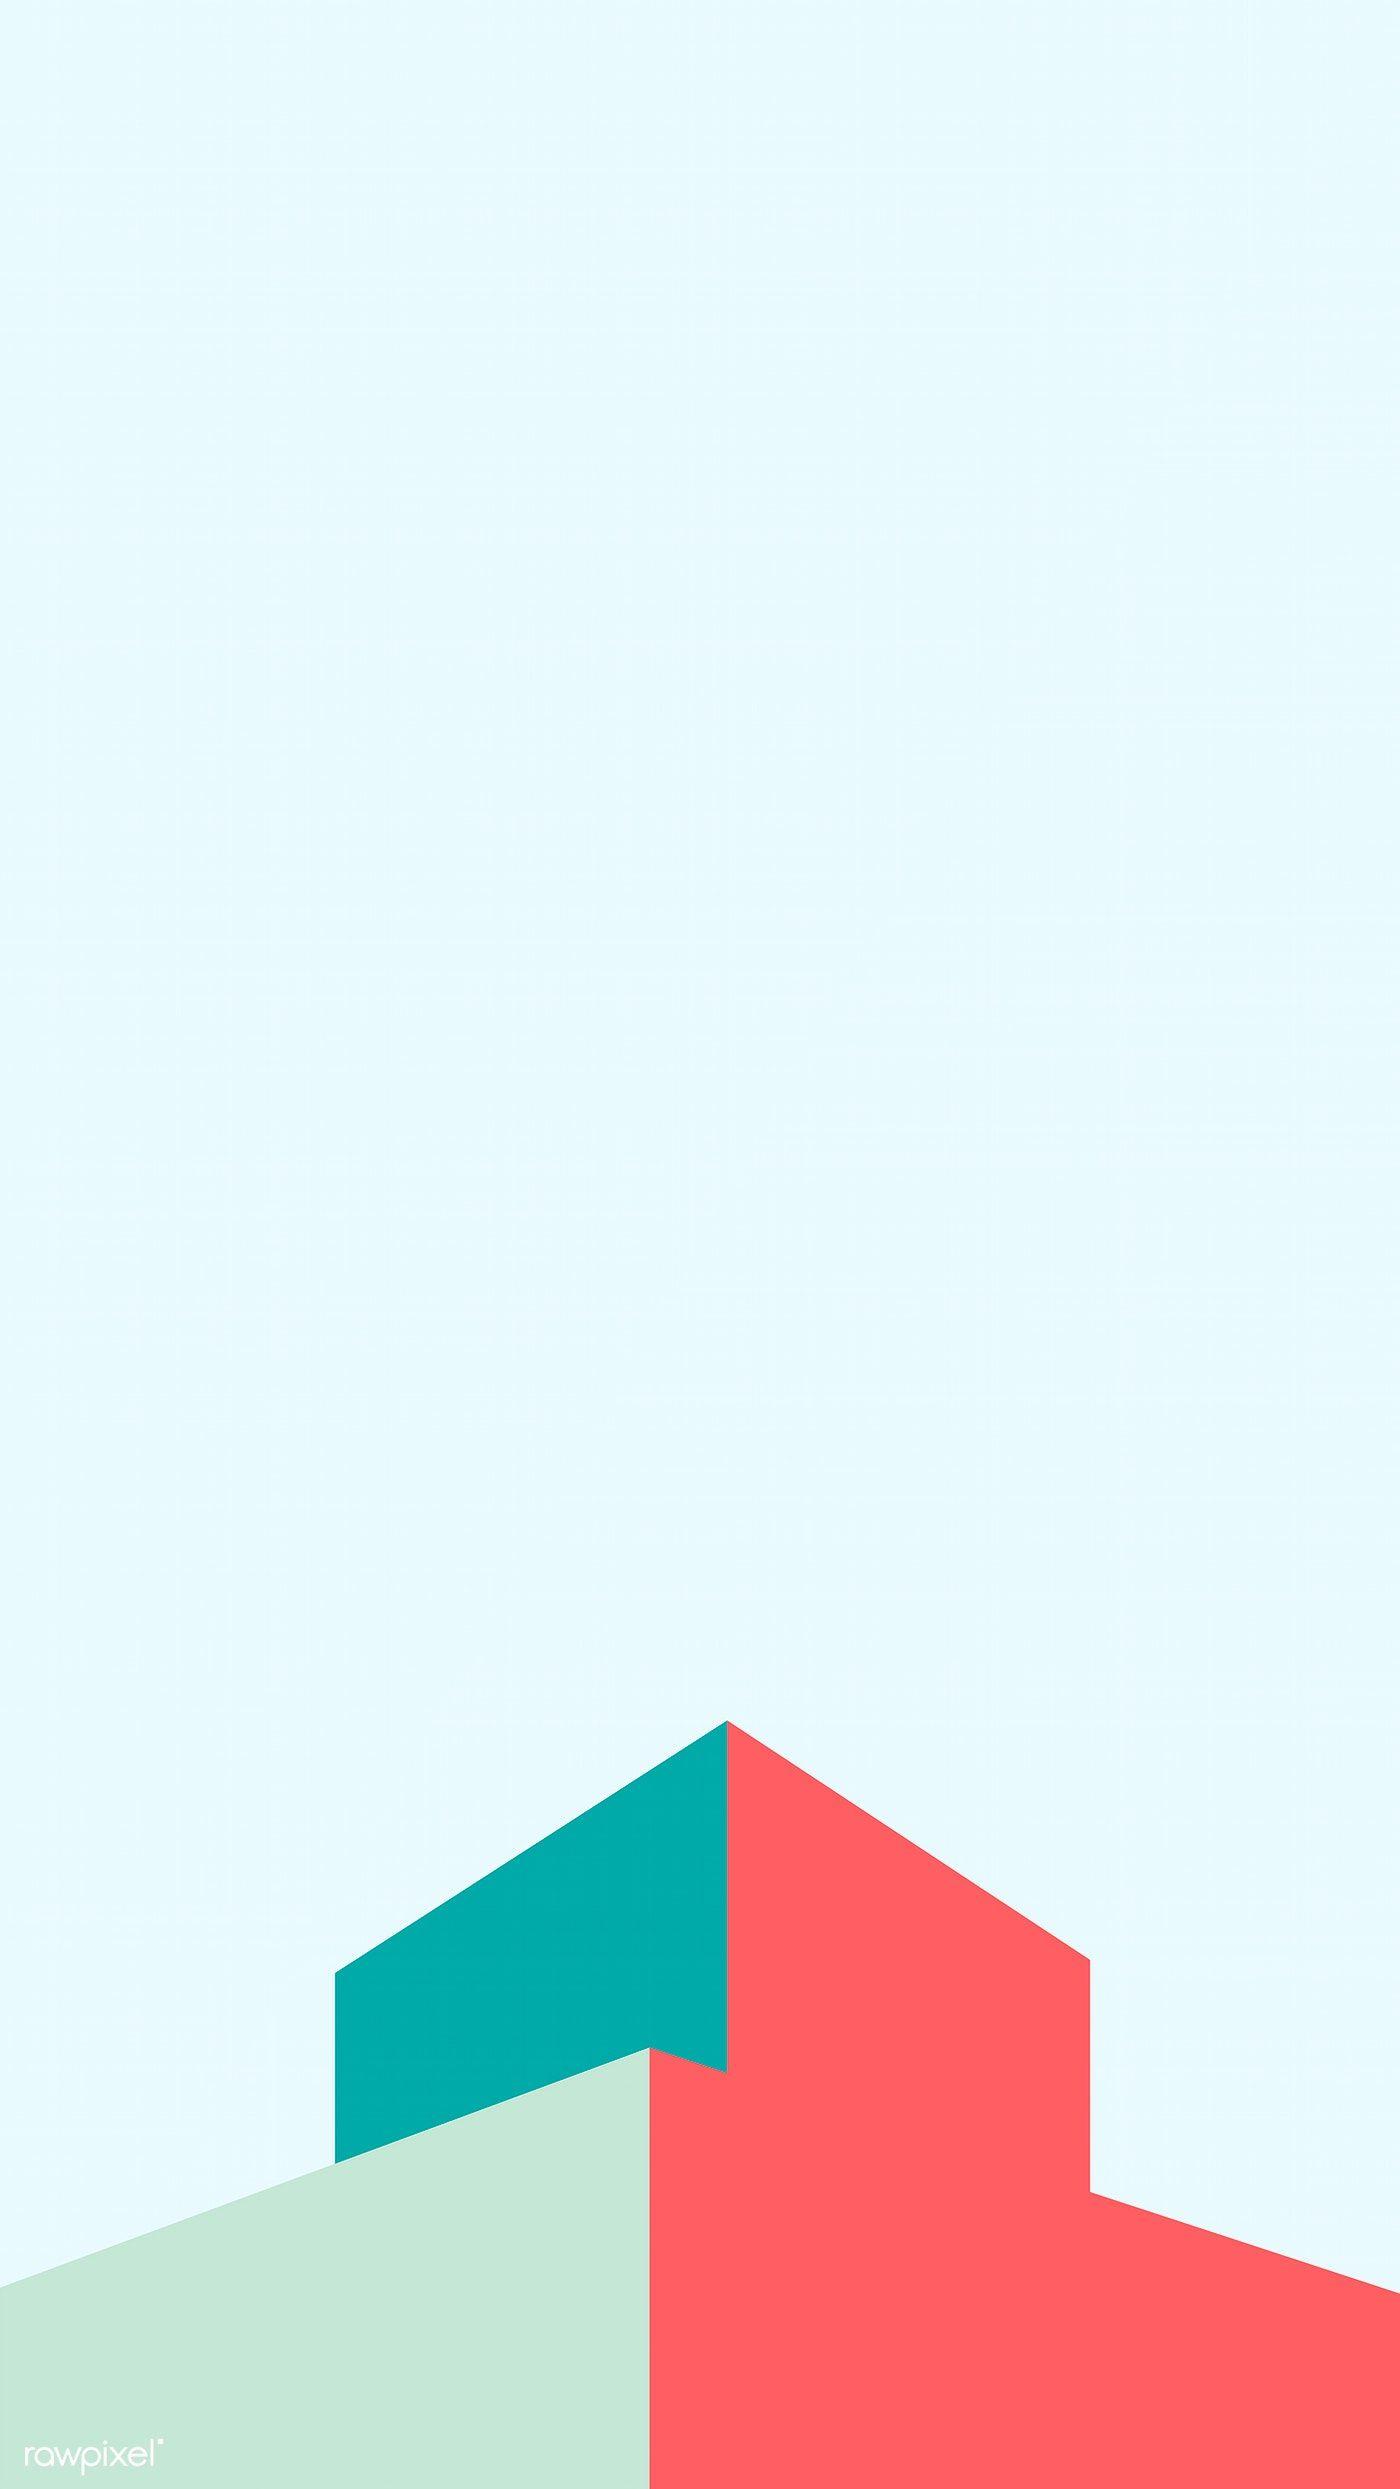 Design Bank 2 Zits Lugo.Download Premium Vector Of Minimal Colorful Building Design Vector